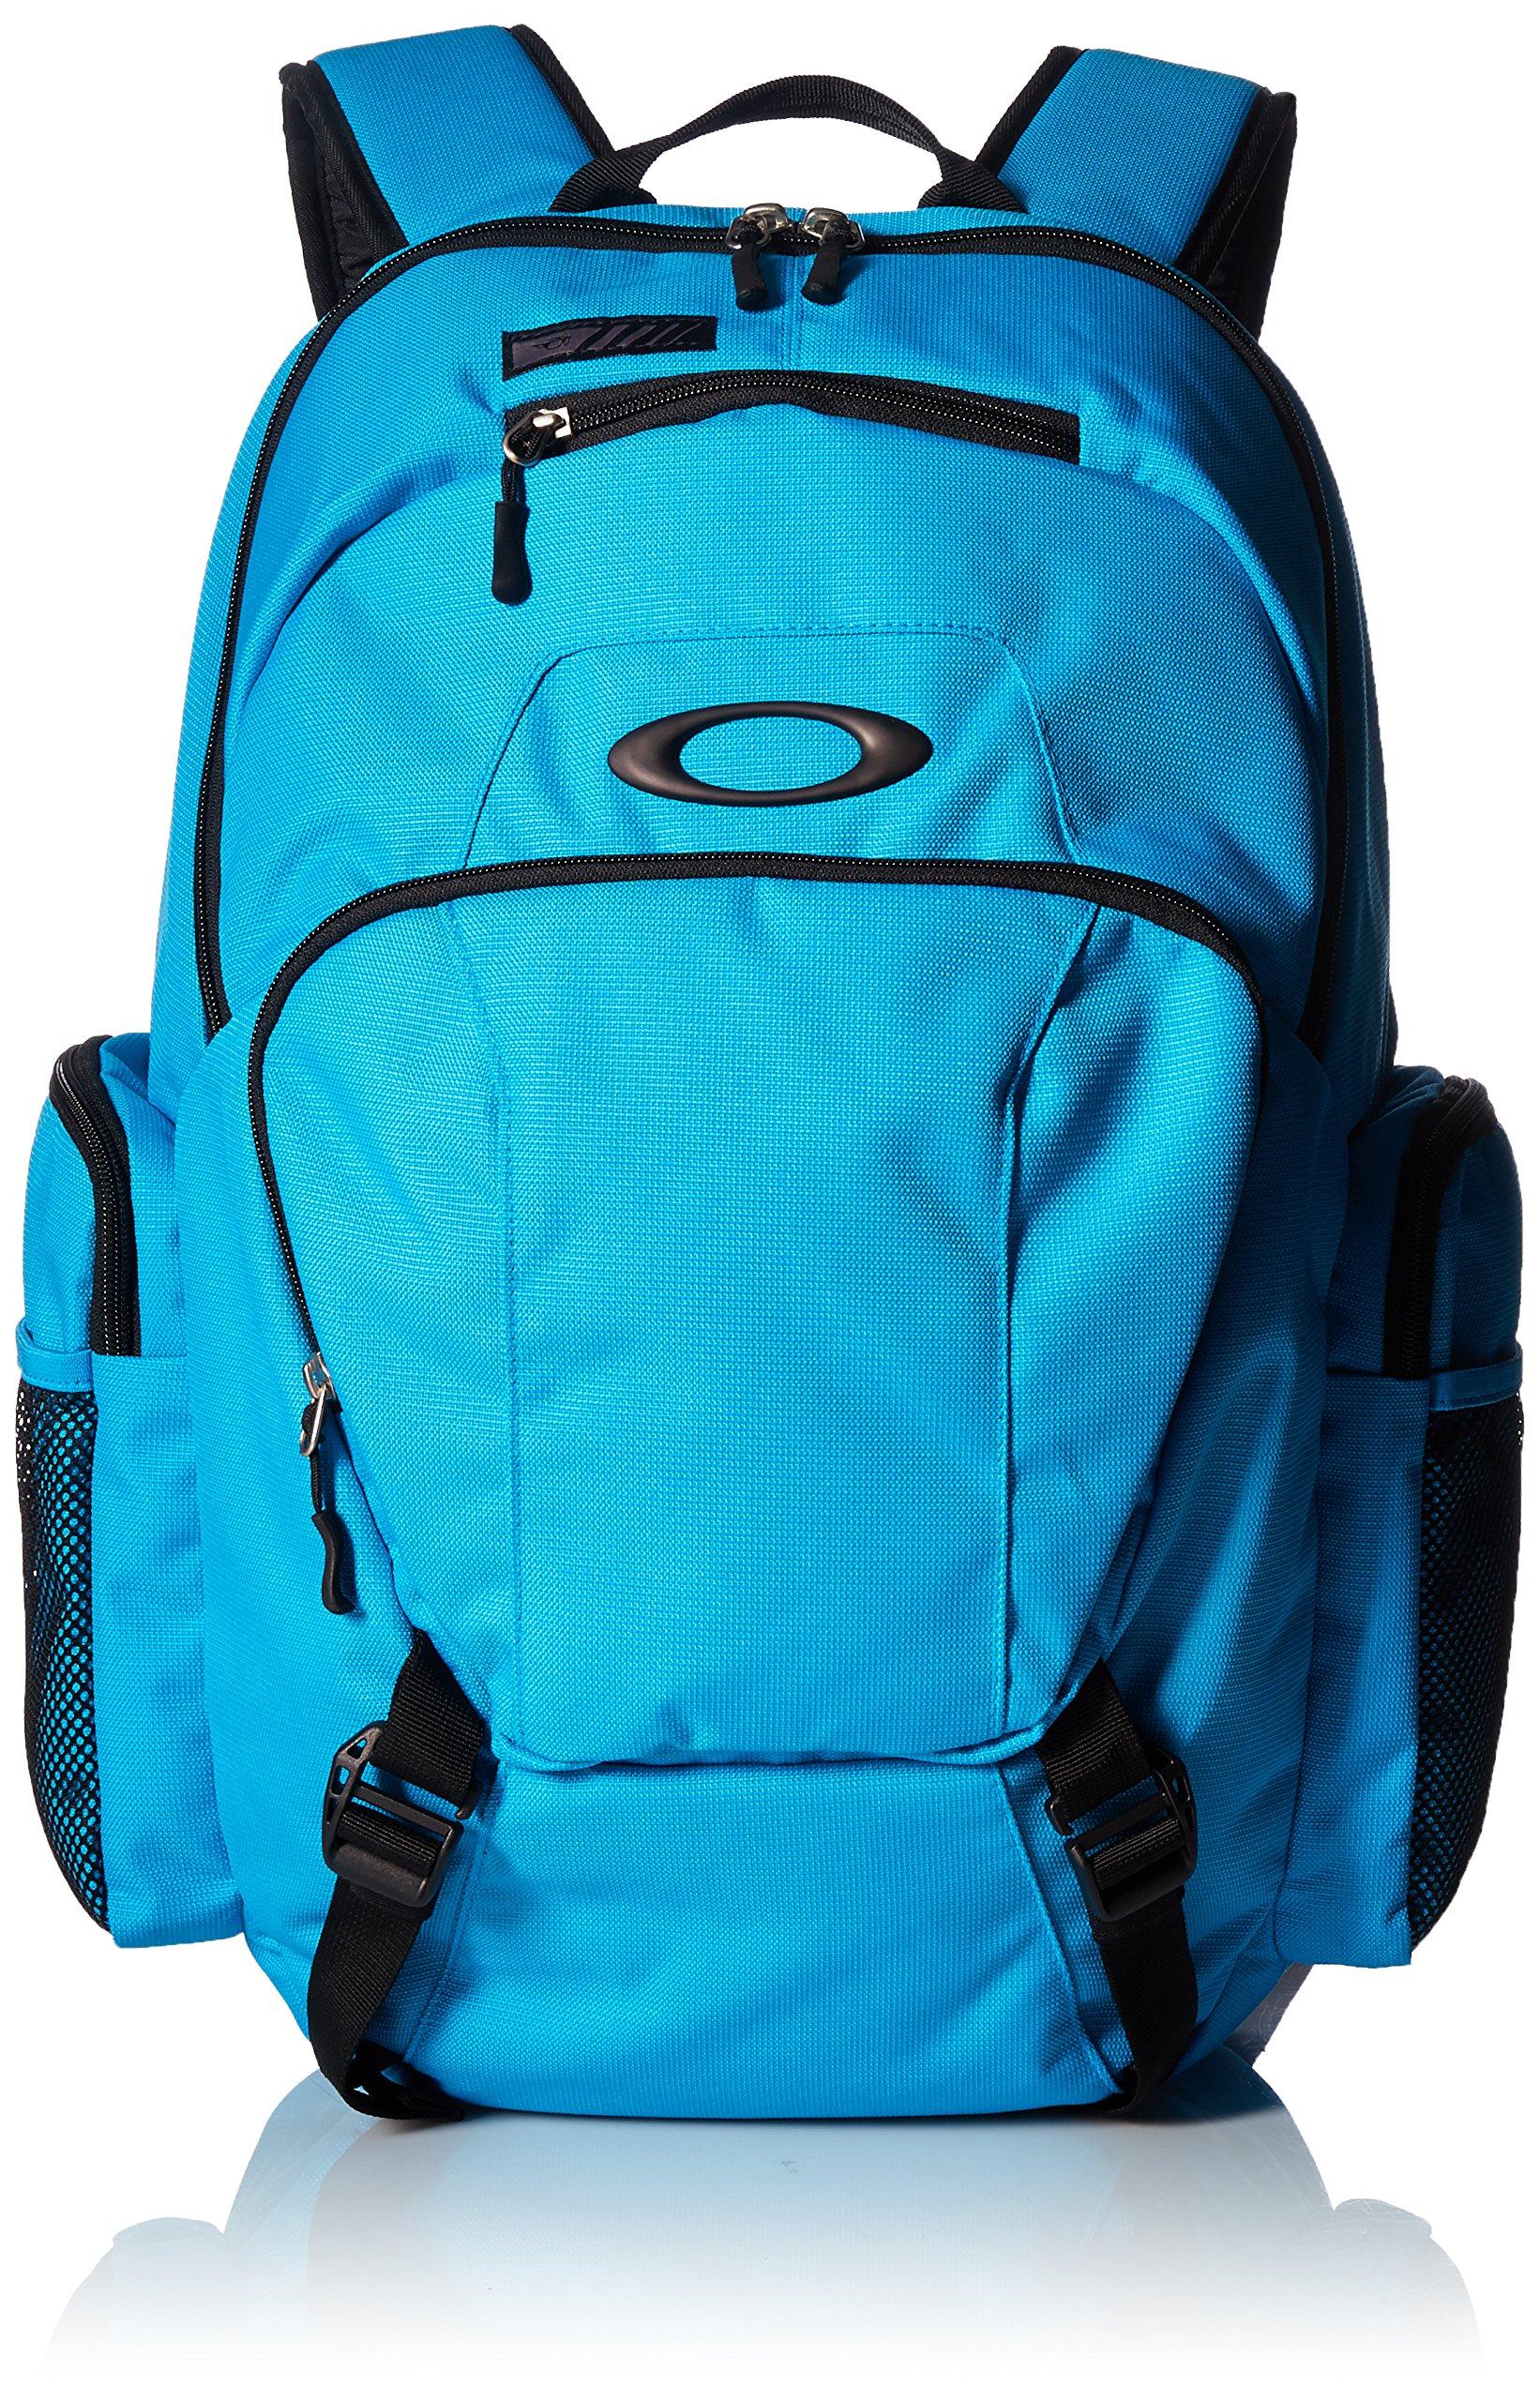 Oakley Luggage: Amazon.com